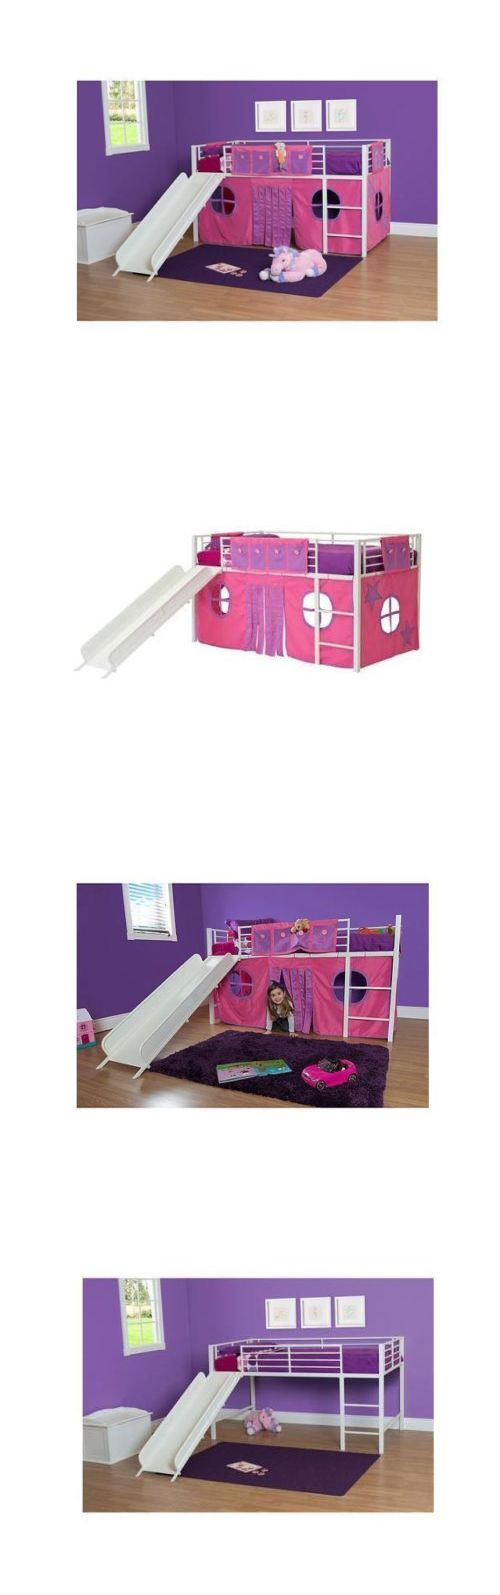 Kids Furniture: Twin Loft Bed With Slide Curtain Set Bonus Ladder White Kids Girl Bedroom New BUY IT NOW ONLY: $249.99